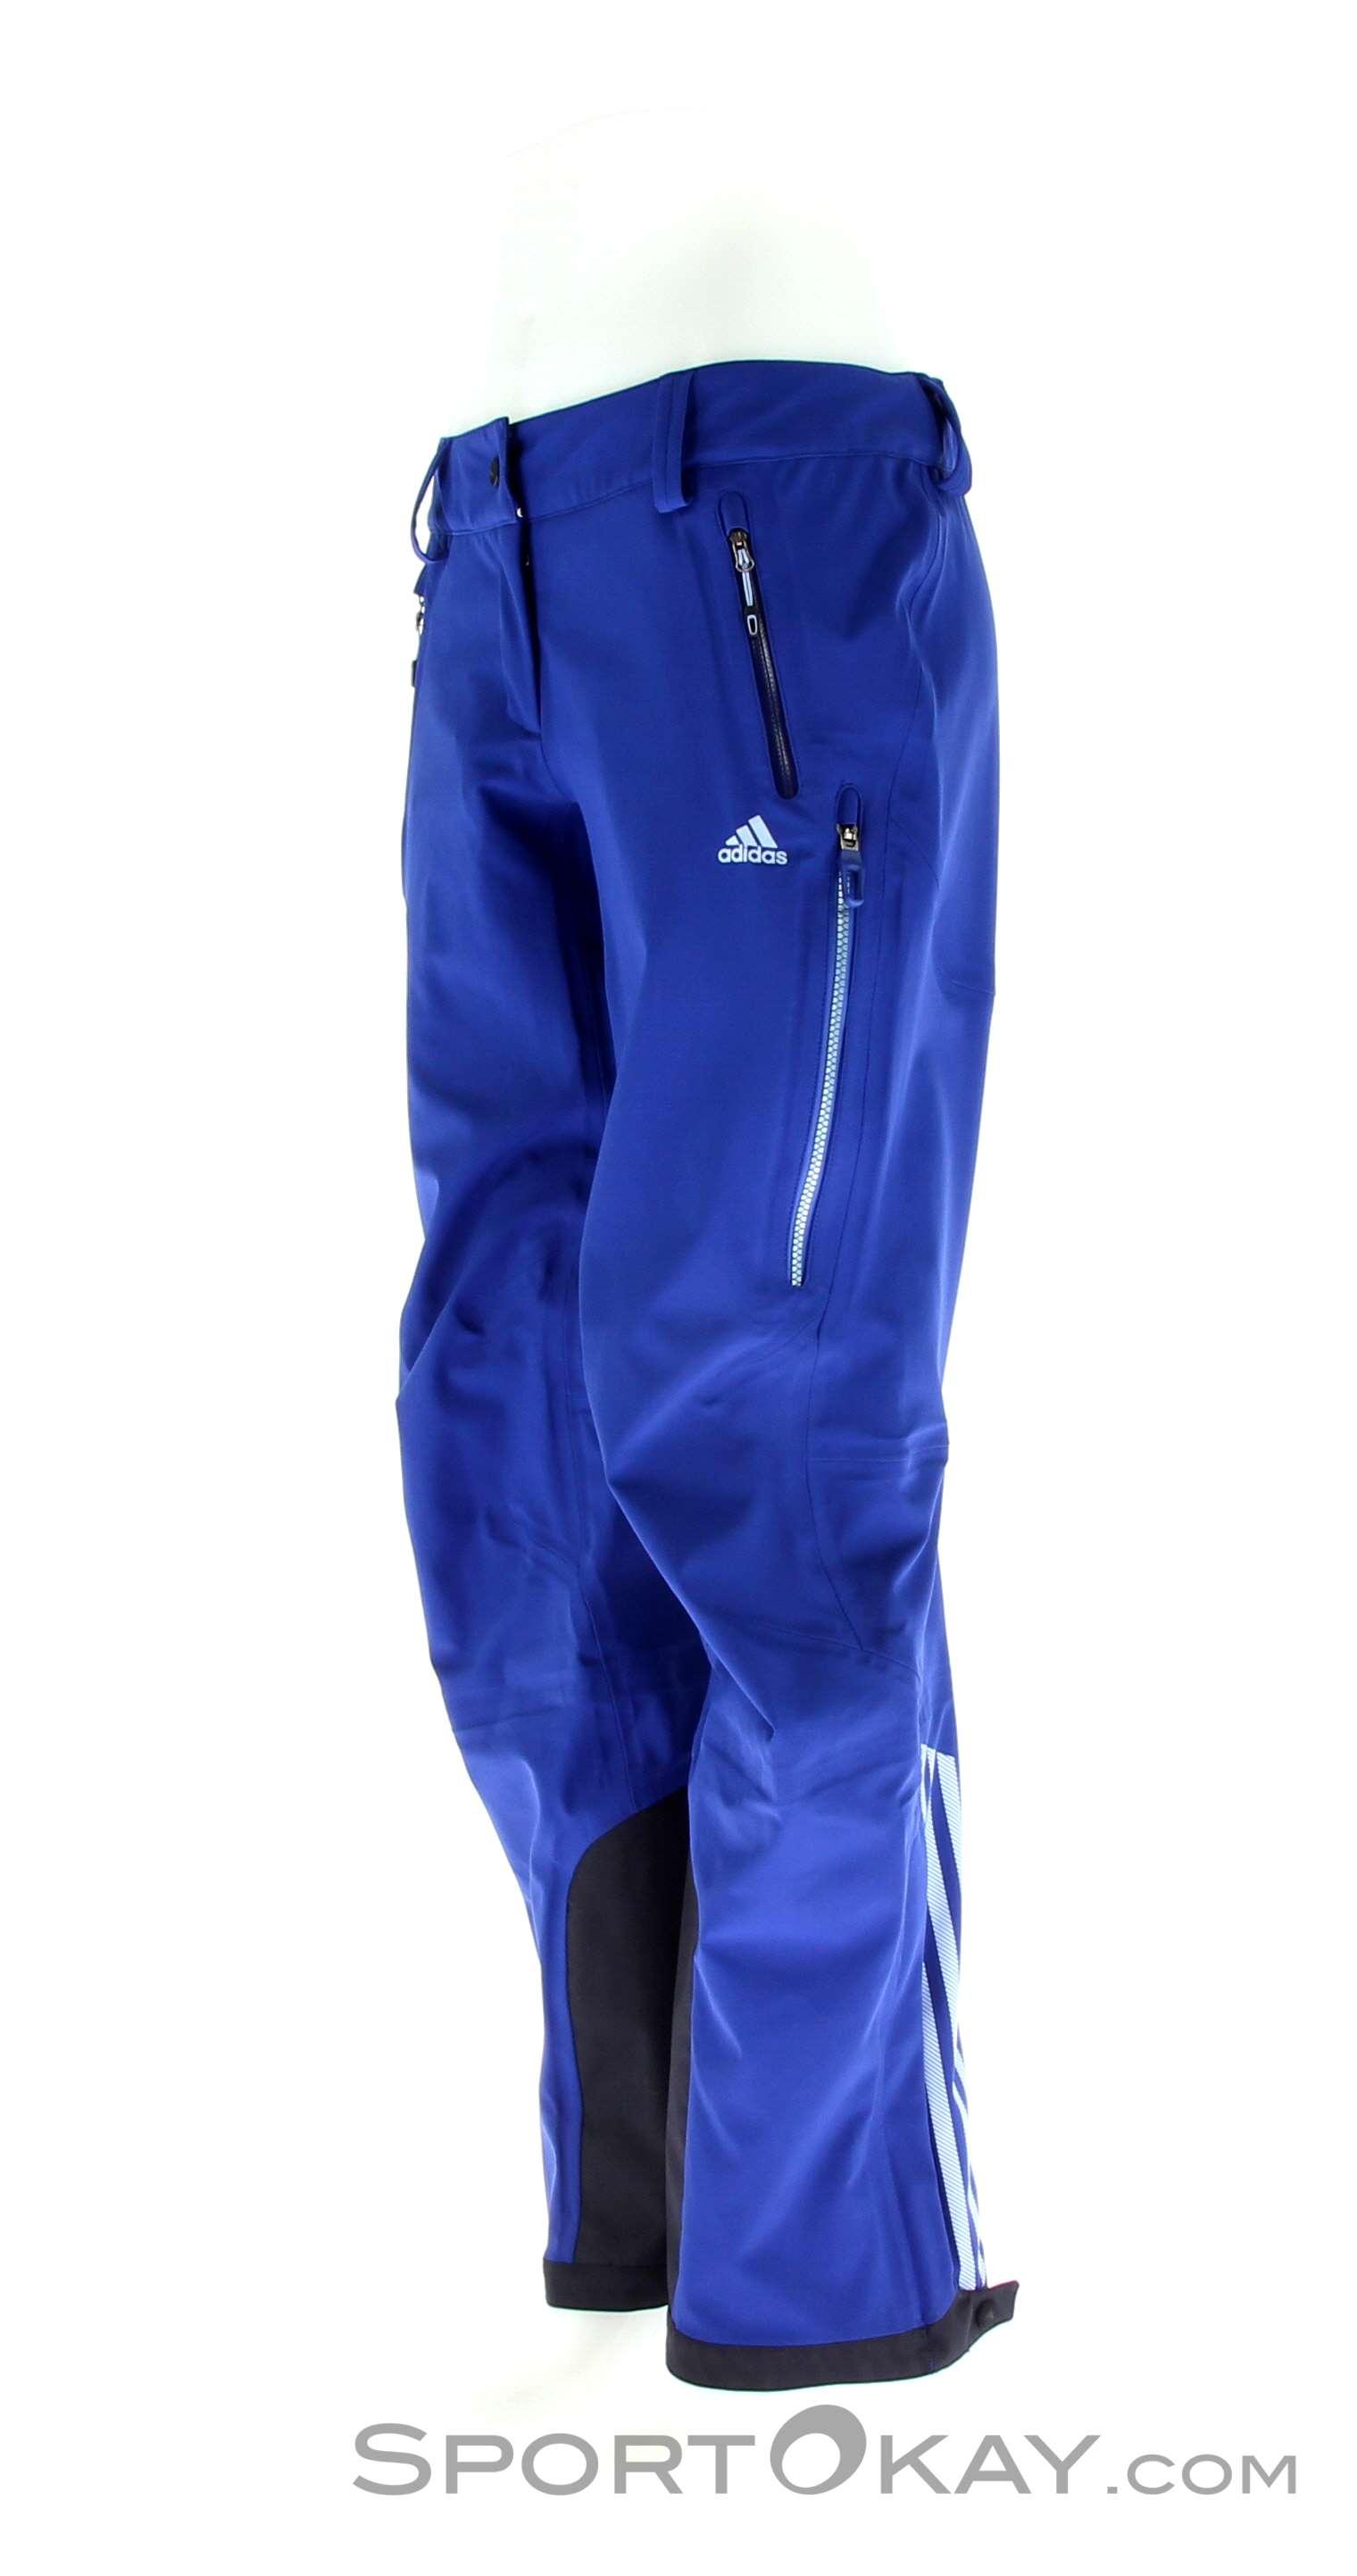 adidas w tx blaueis damen skihose skihosen skibekleidung ski freeride alle. Black Bedroom Furniture Sets. Home Design Ideas